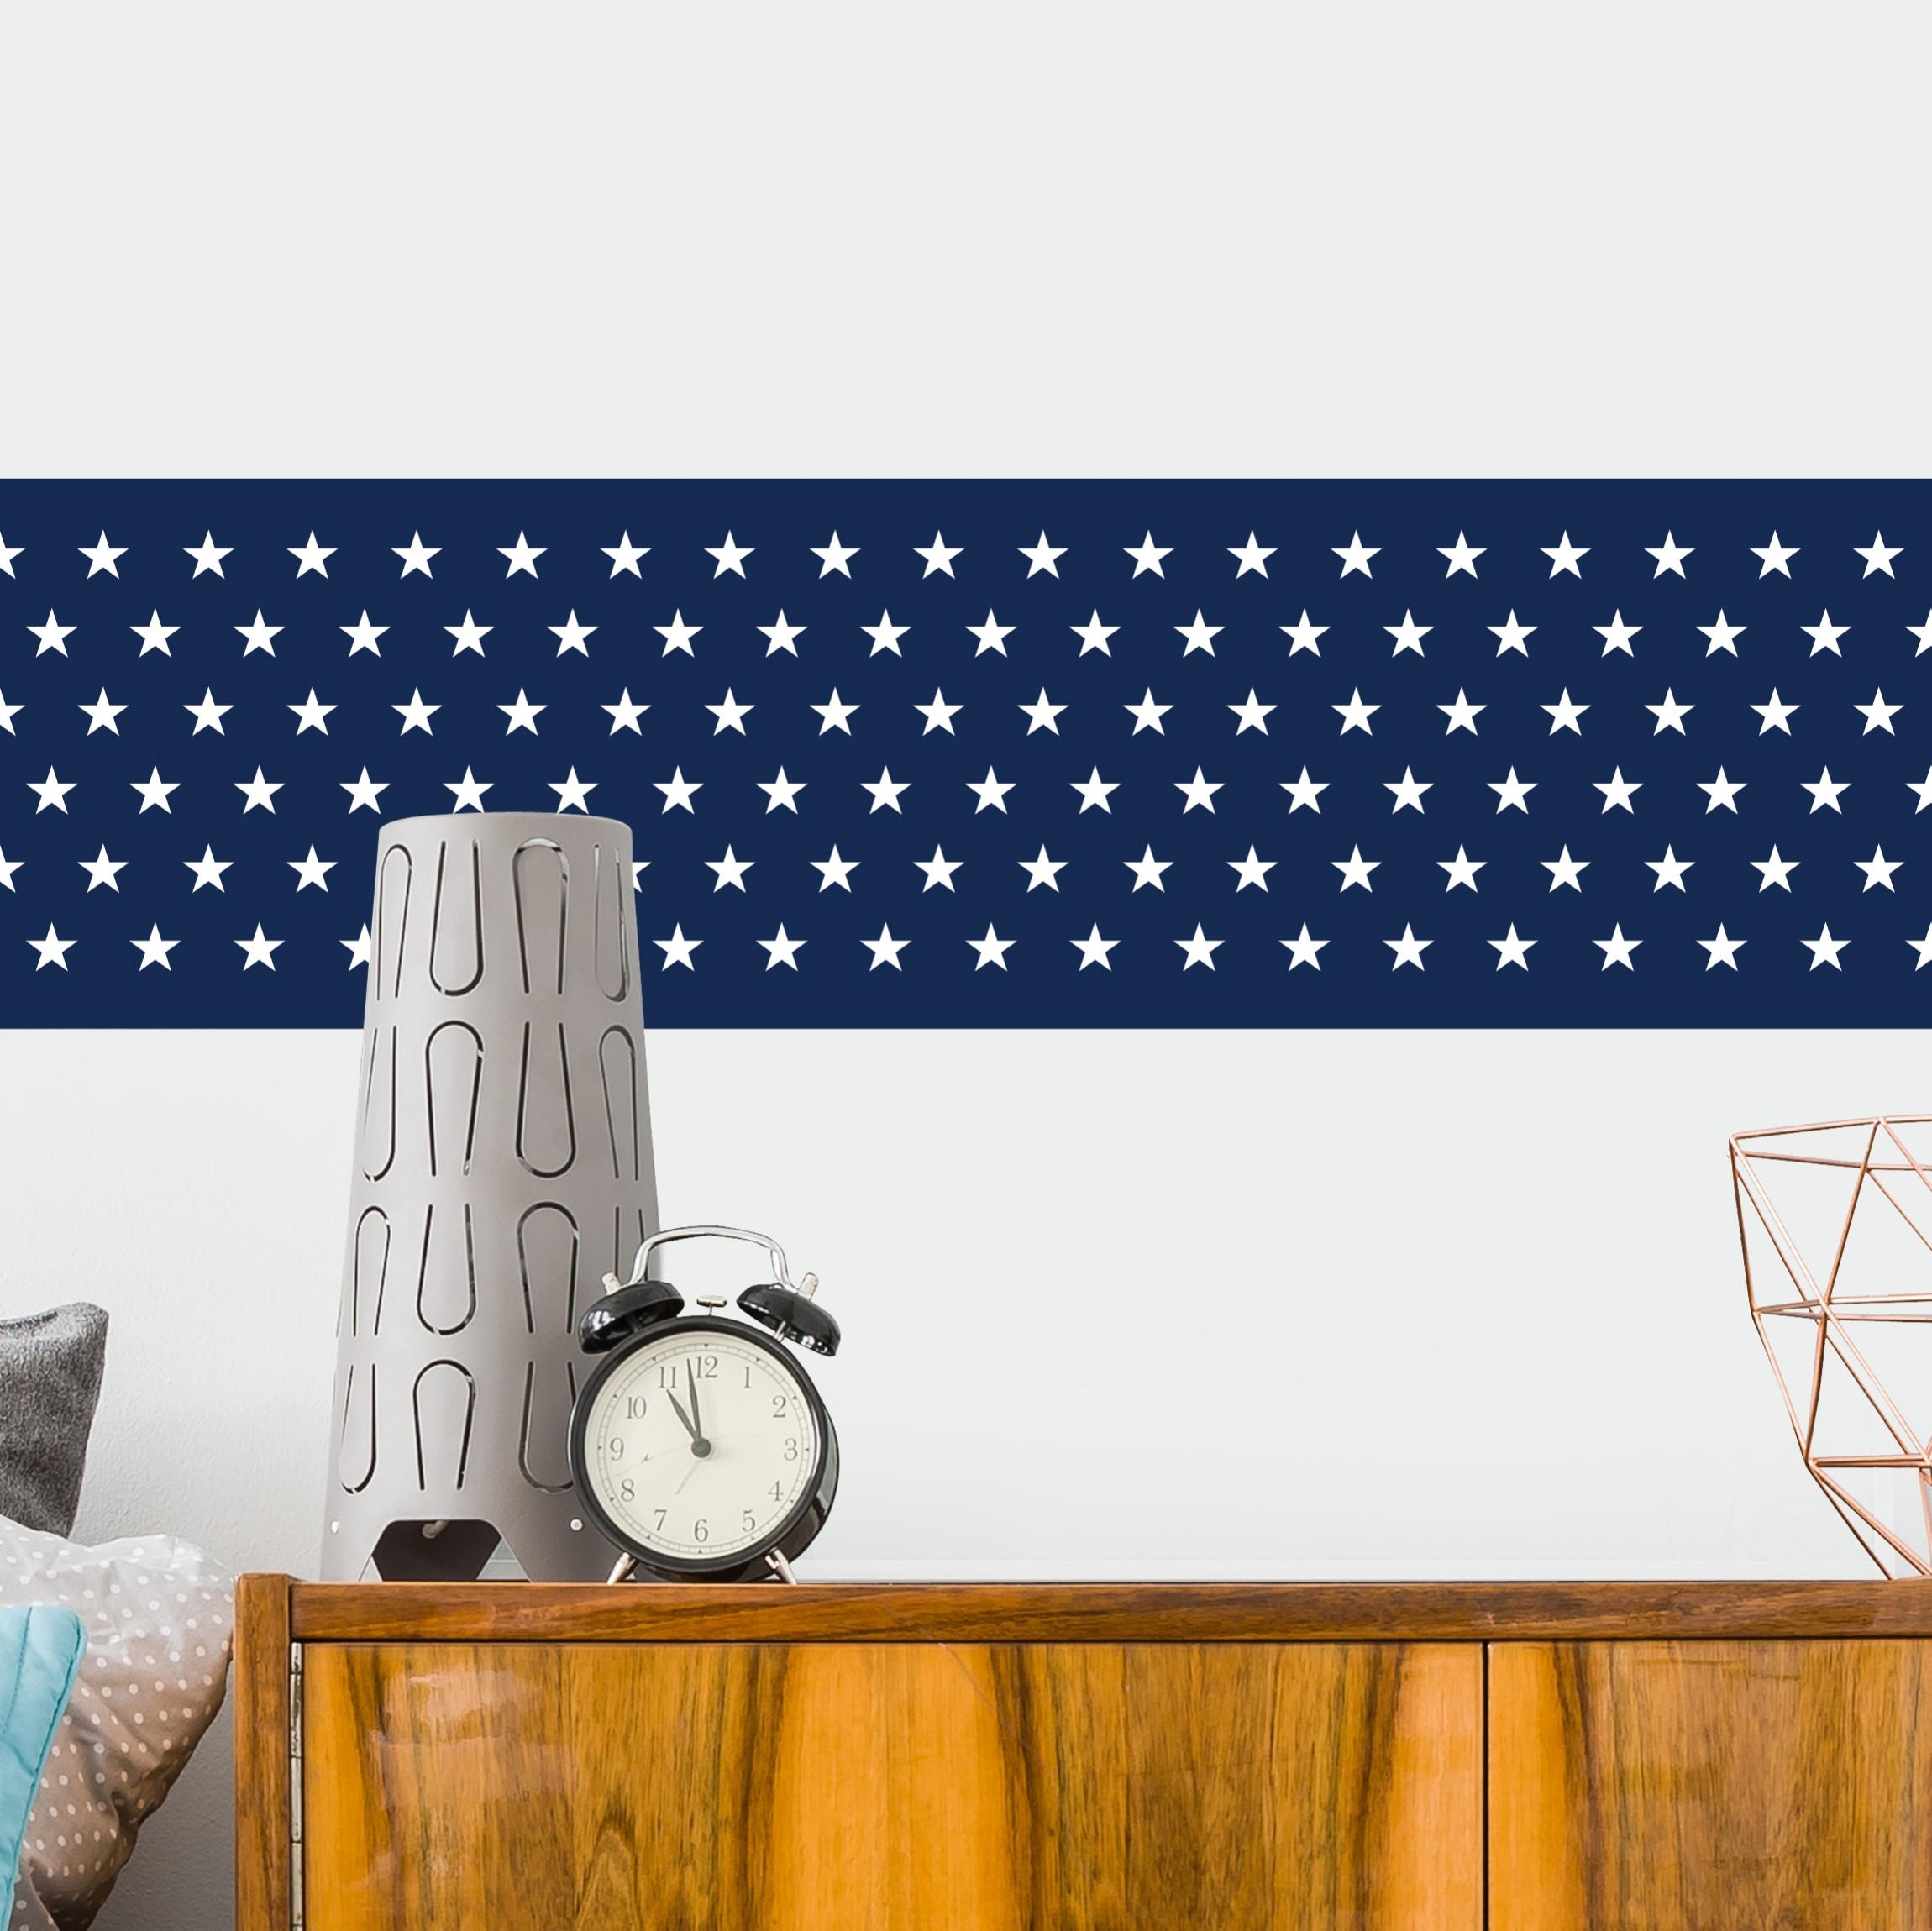 Beliebt Bordüre selbstklebend - Maritime Stern Tapetenbordüre in GG74